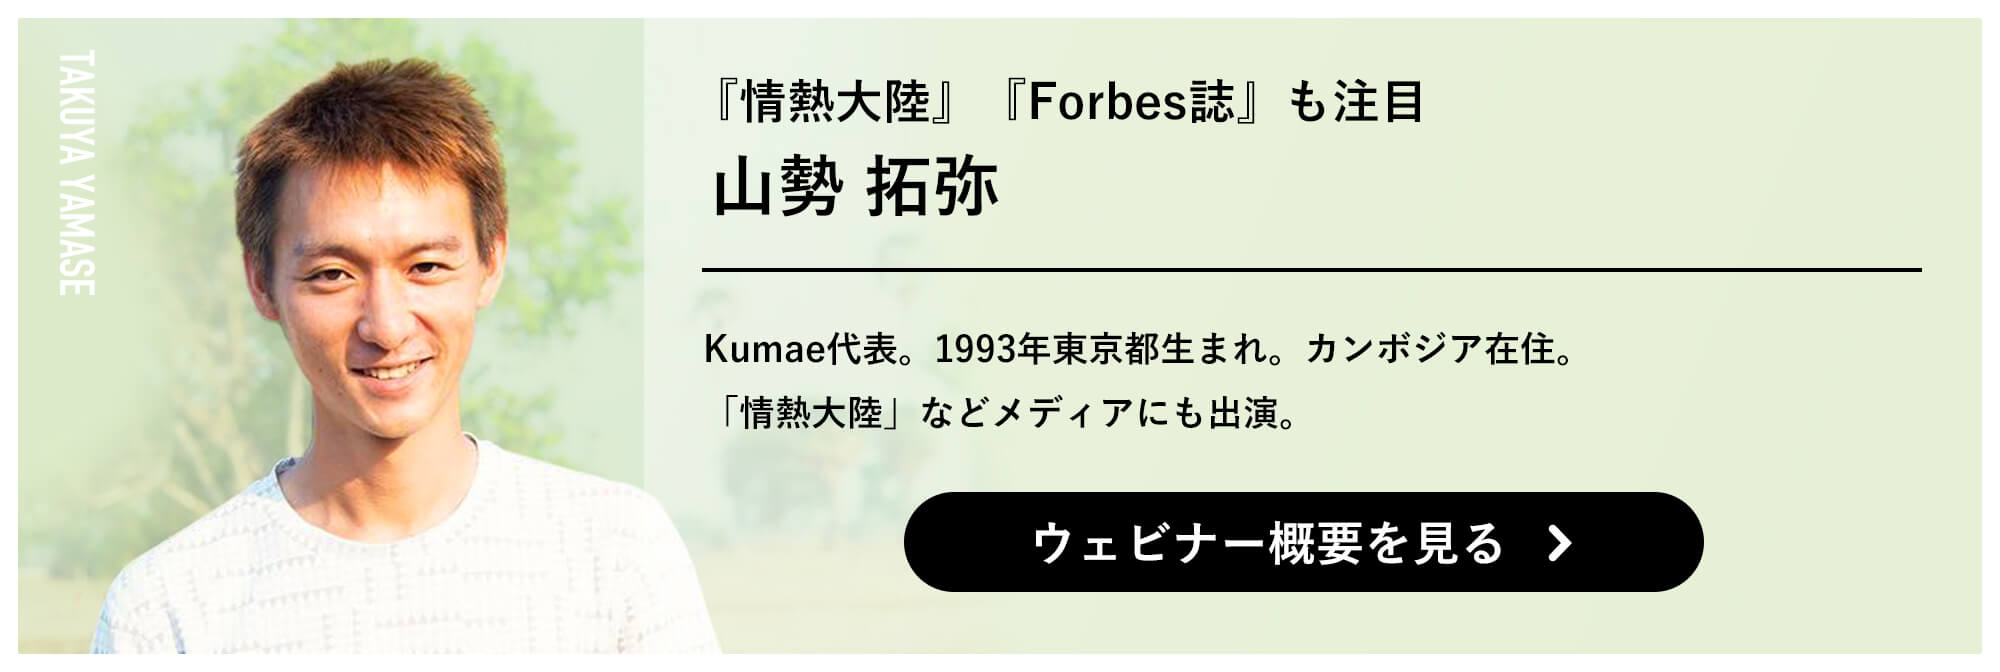 『情熱大陸』『Forbes誌』も注目 山勢拓弥